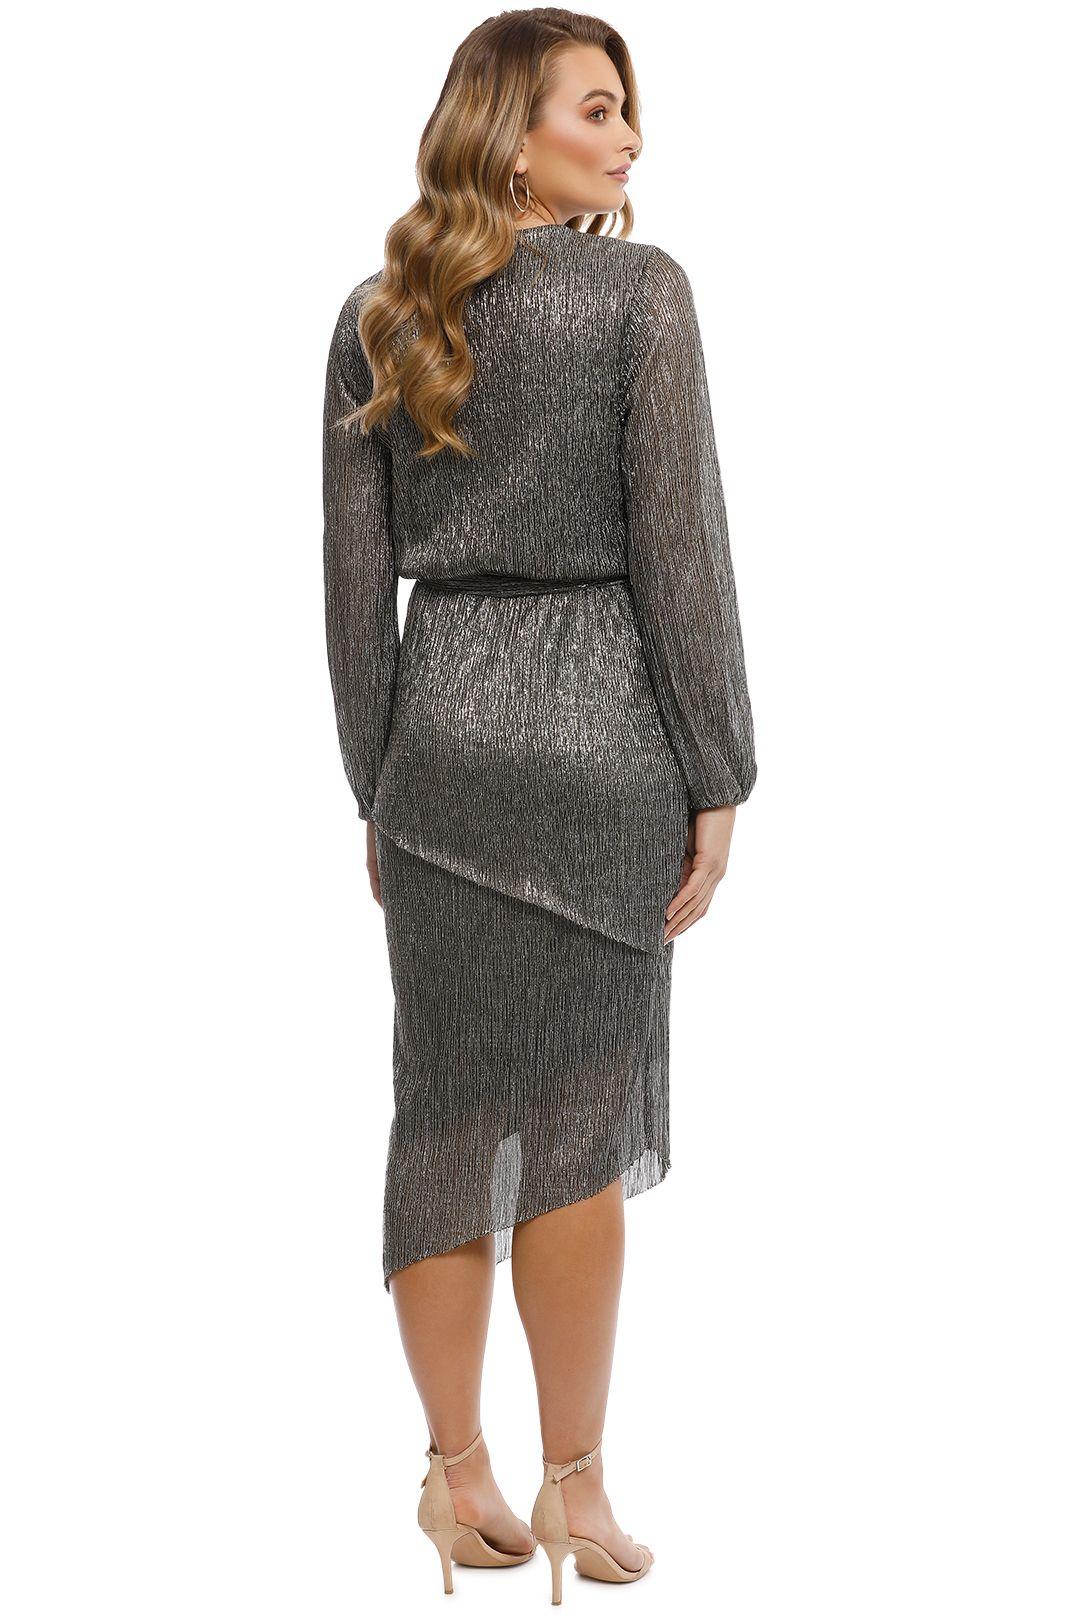 Rebecca Vallance - Paparazzi Drape Long Sleeve Dress - Back